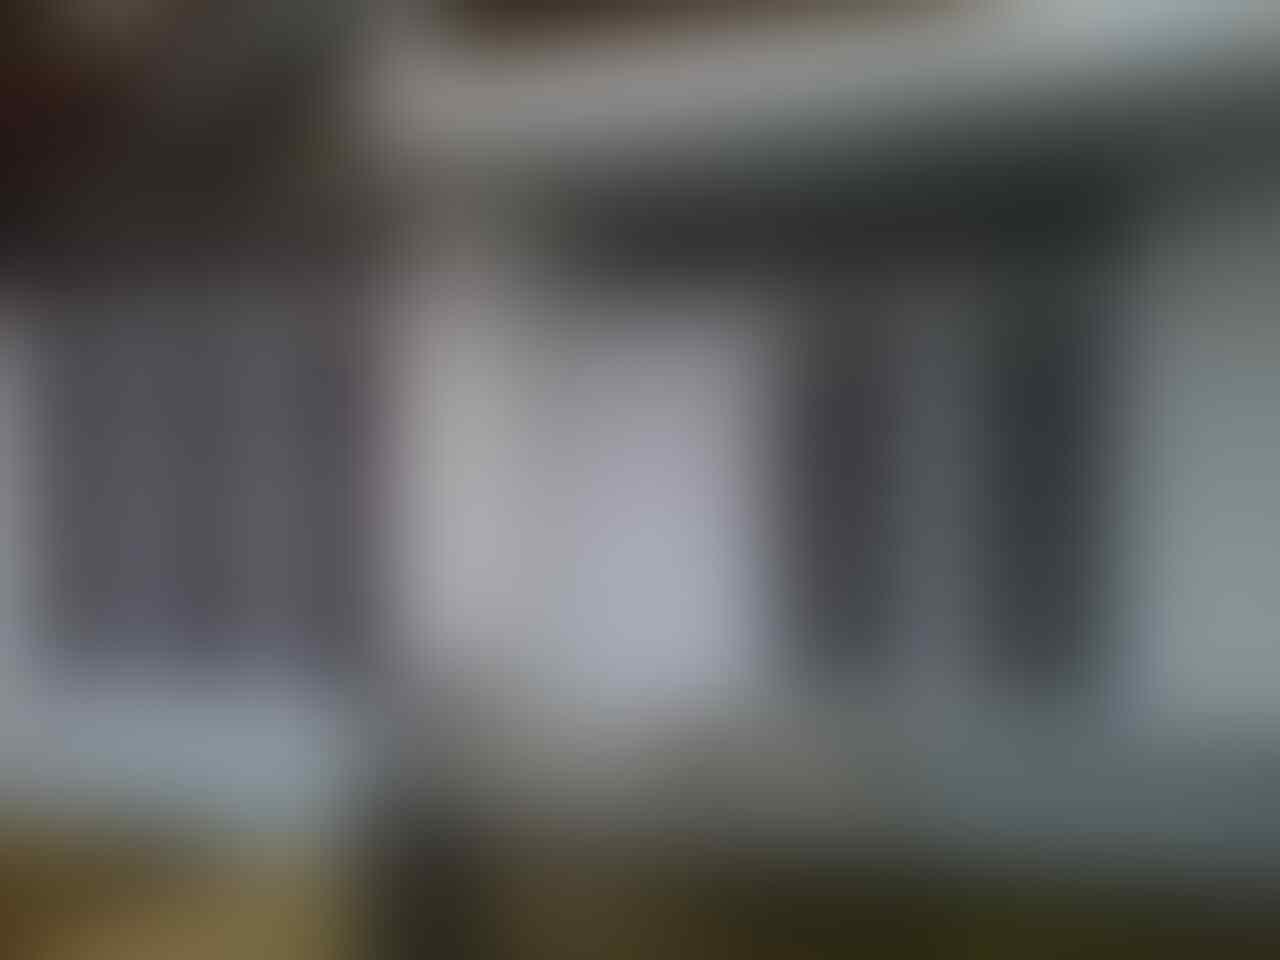 Dijual Rumah type 50/90 di Dayeuhkolot Bandung